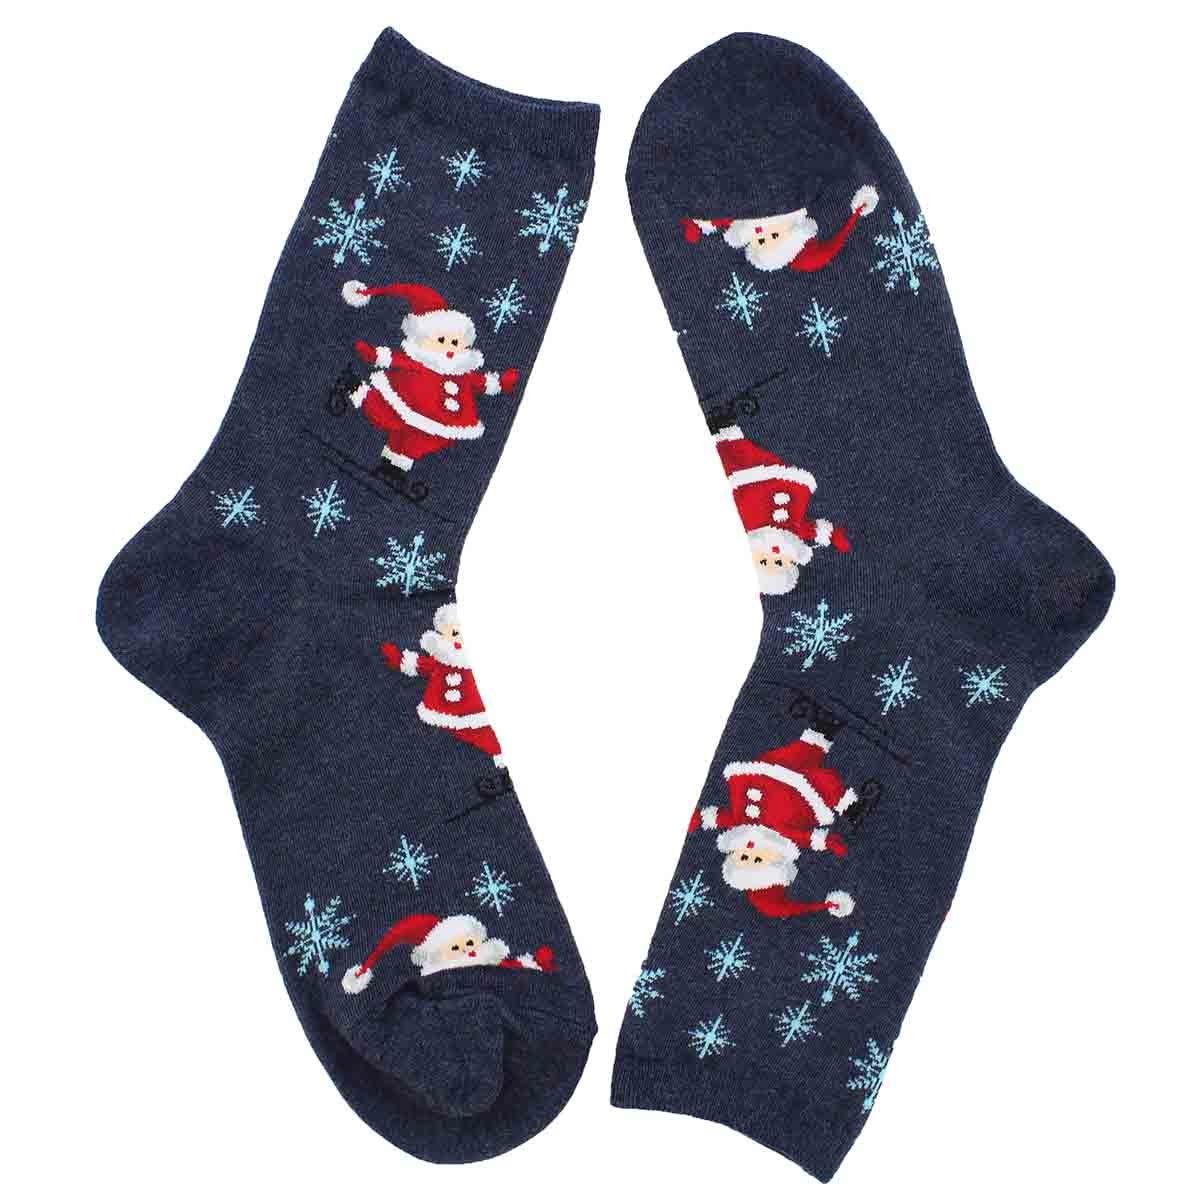 Lds Skating Santas grey printed sock